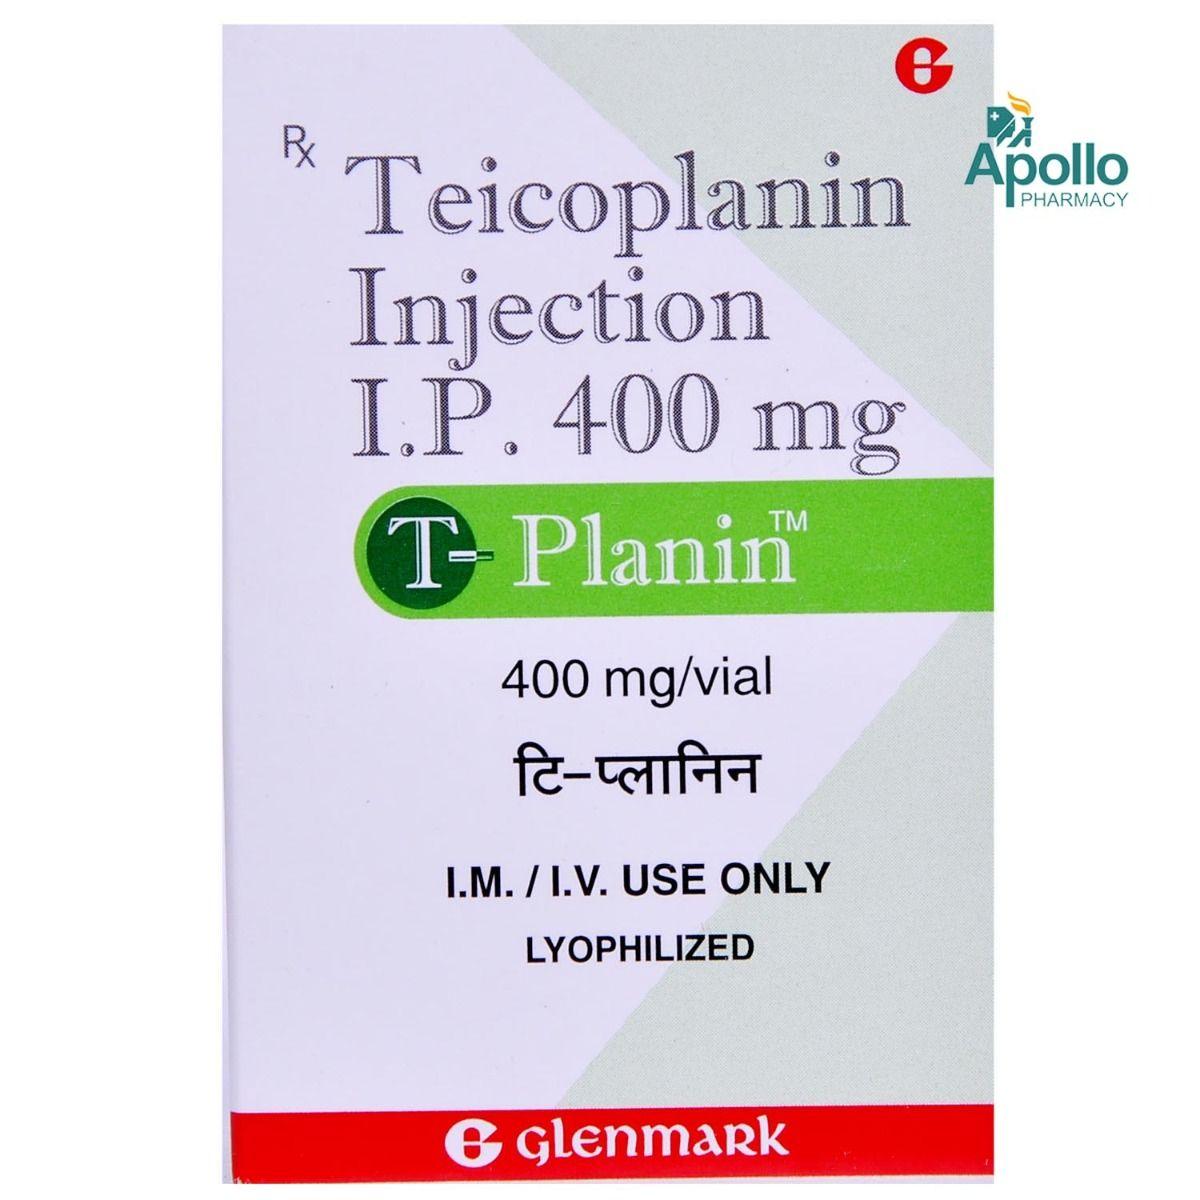 TPLANIN 400MG INJECTION